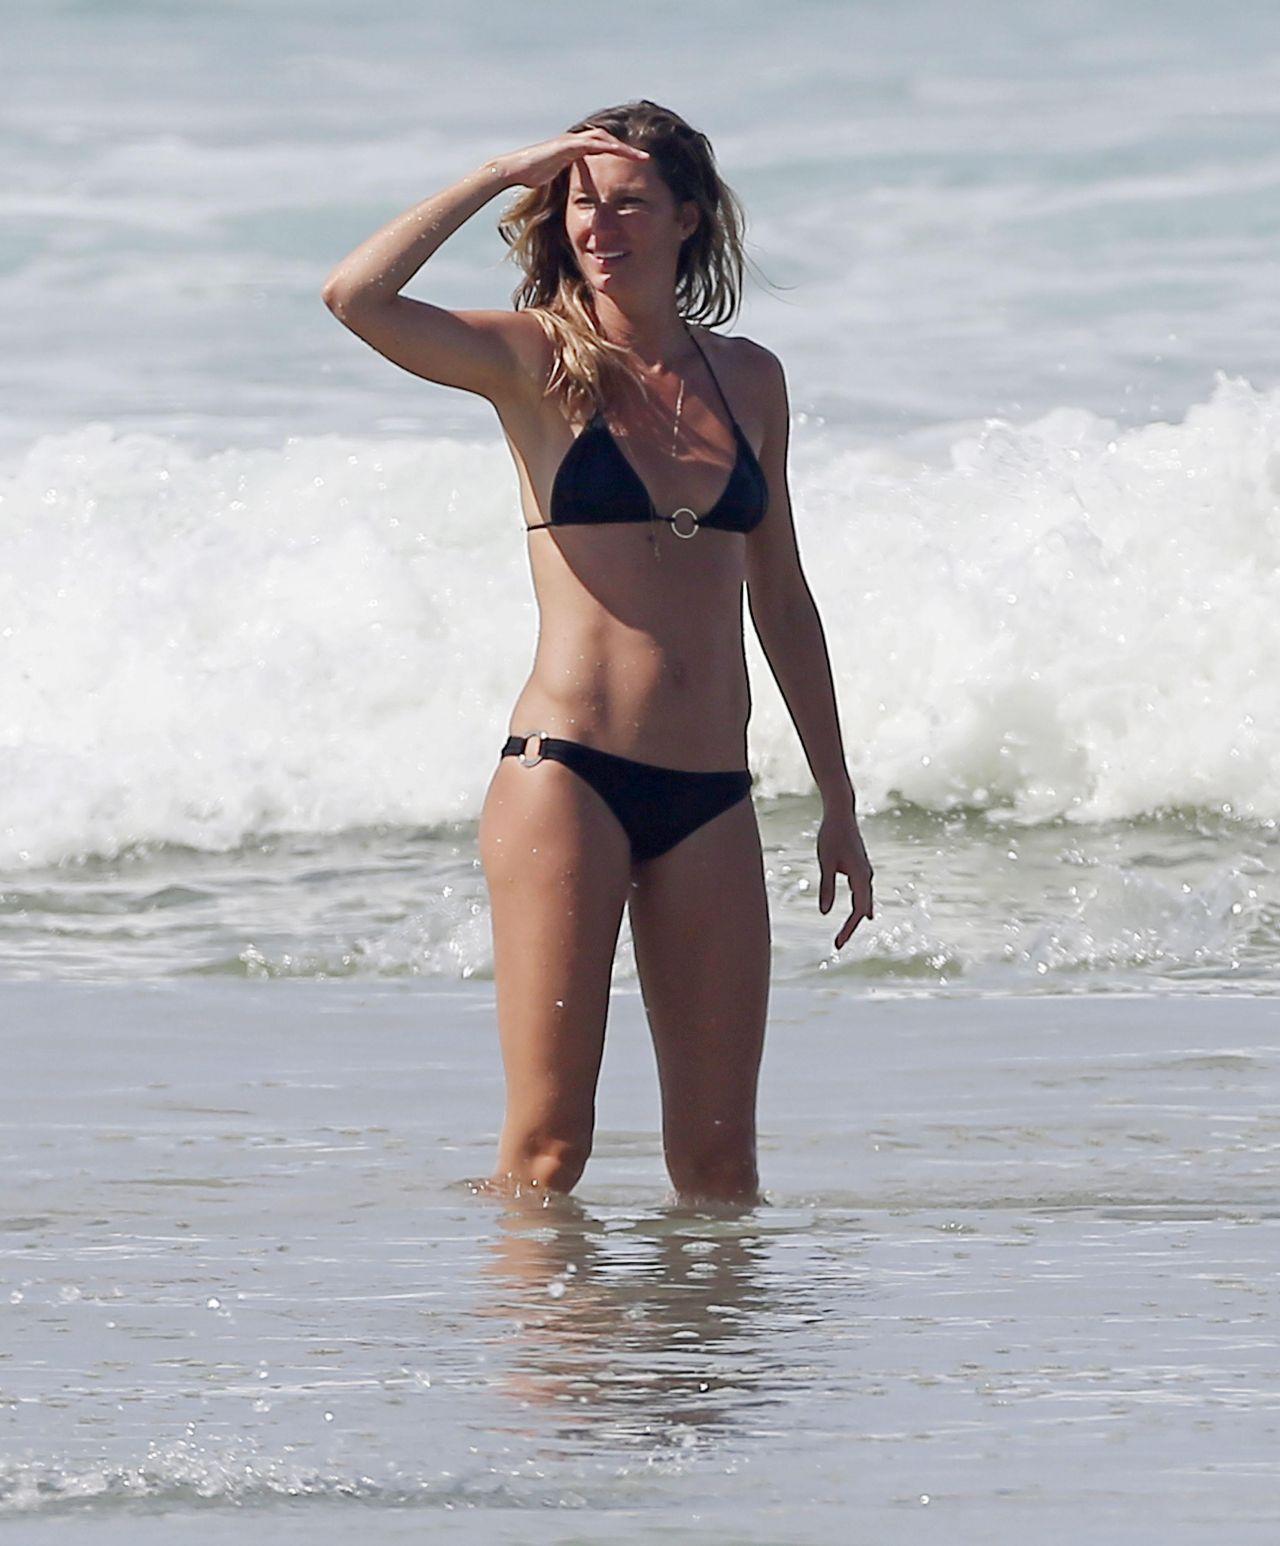 Gisele Bundchen In A Bikini On The Beach With Her Sister